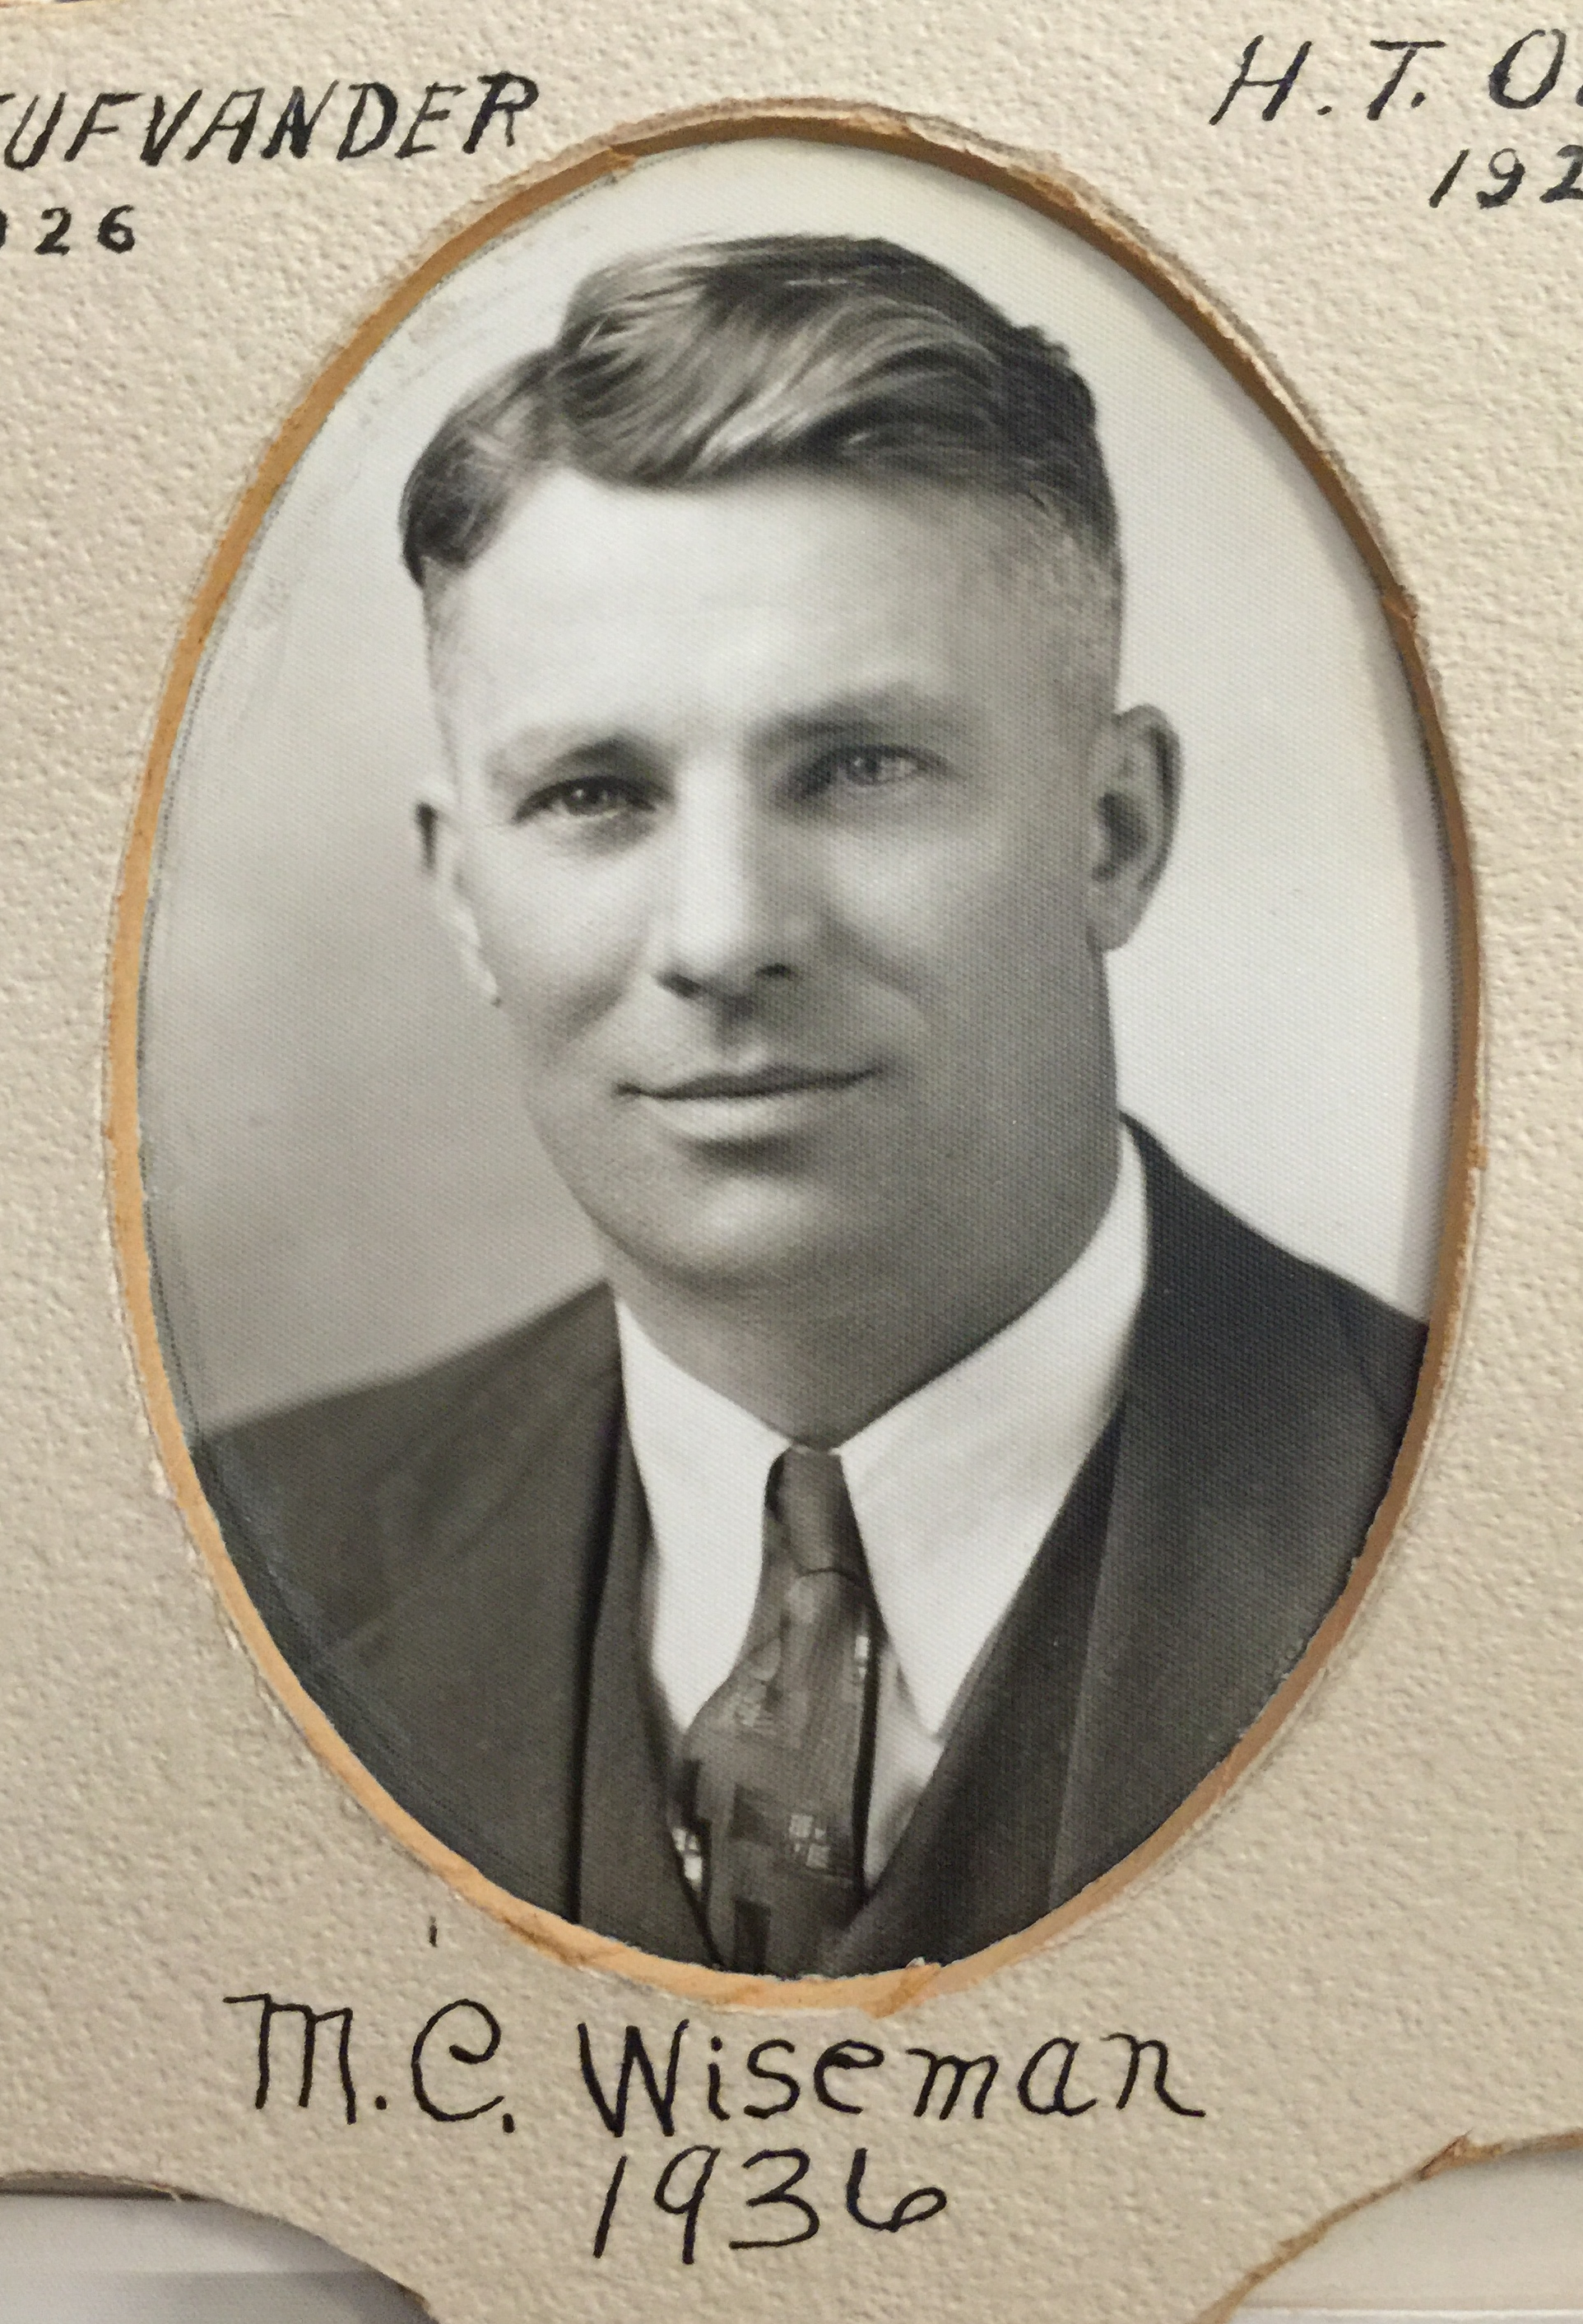 1936 M.C. Wiseman